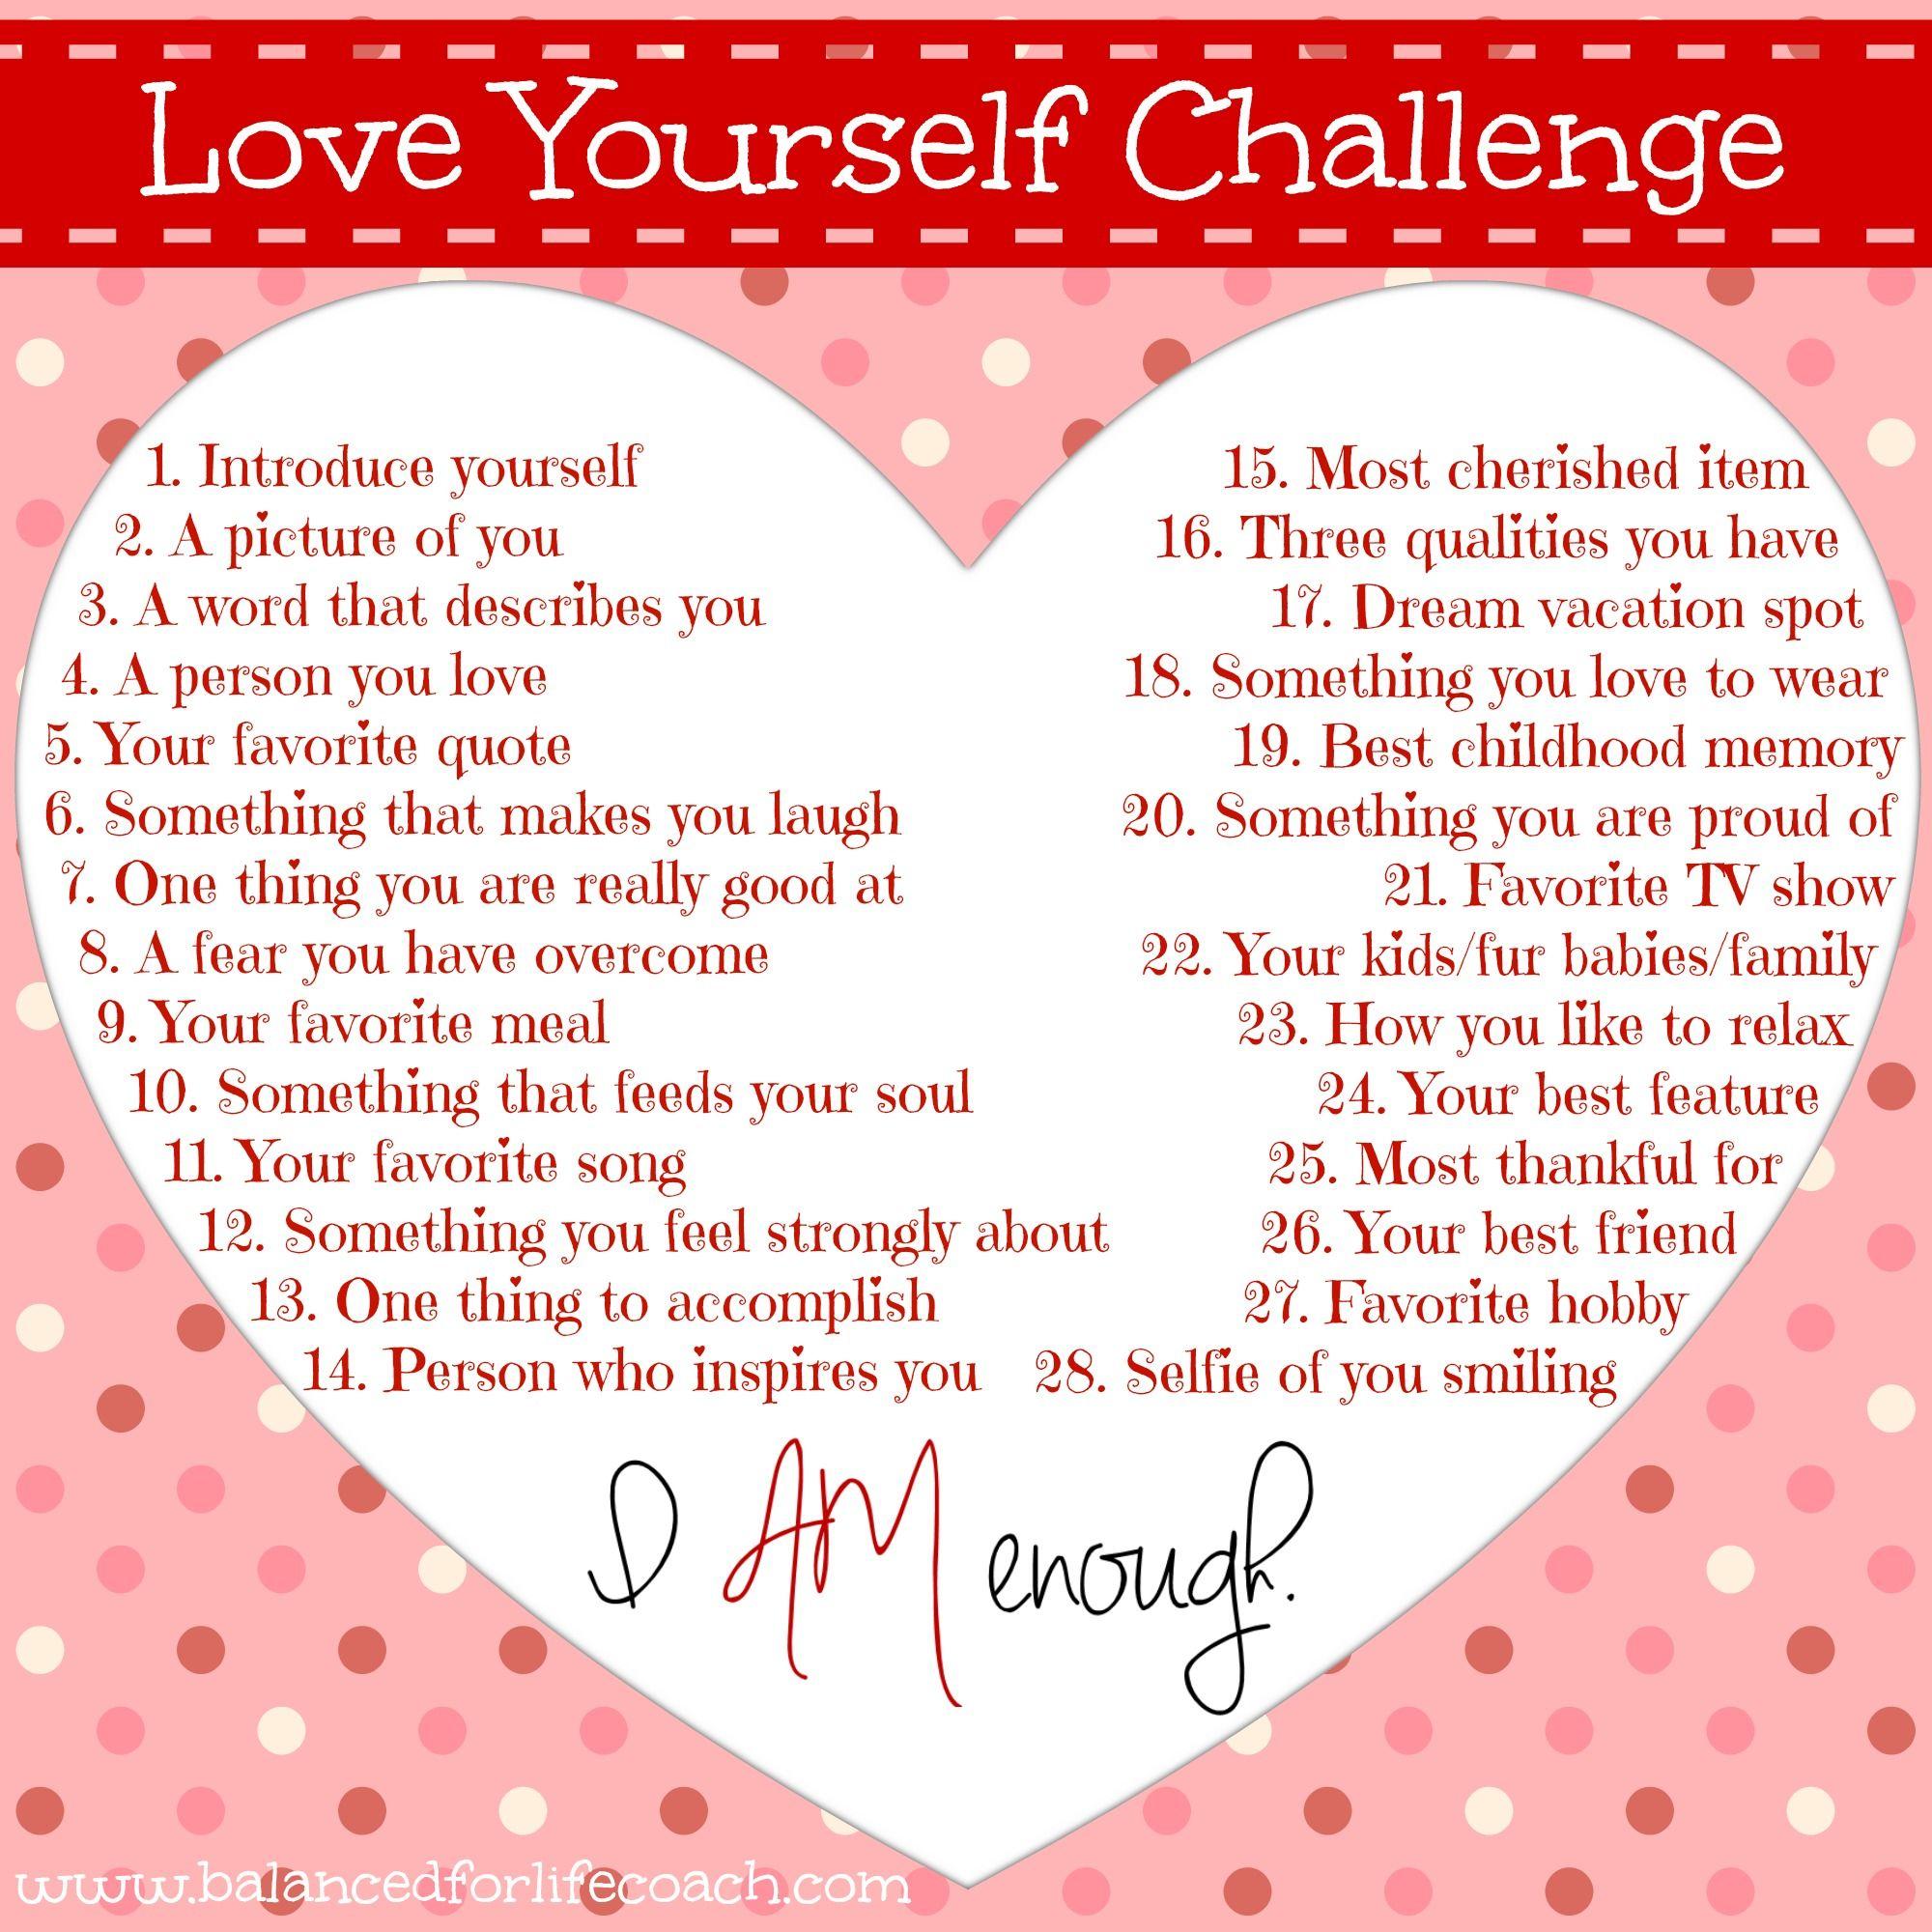 FREE Self Love Challenge **Click LINK Below To Join** #Love #SelfLove #SelfConfidence #FreeChallenge #MakeYourselfAPriority